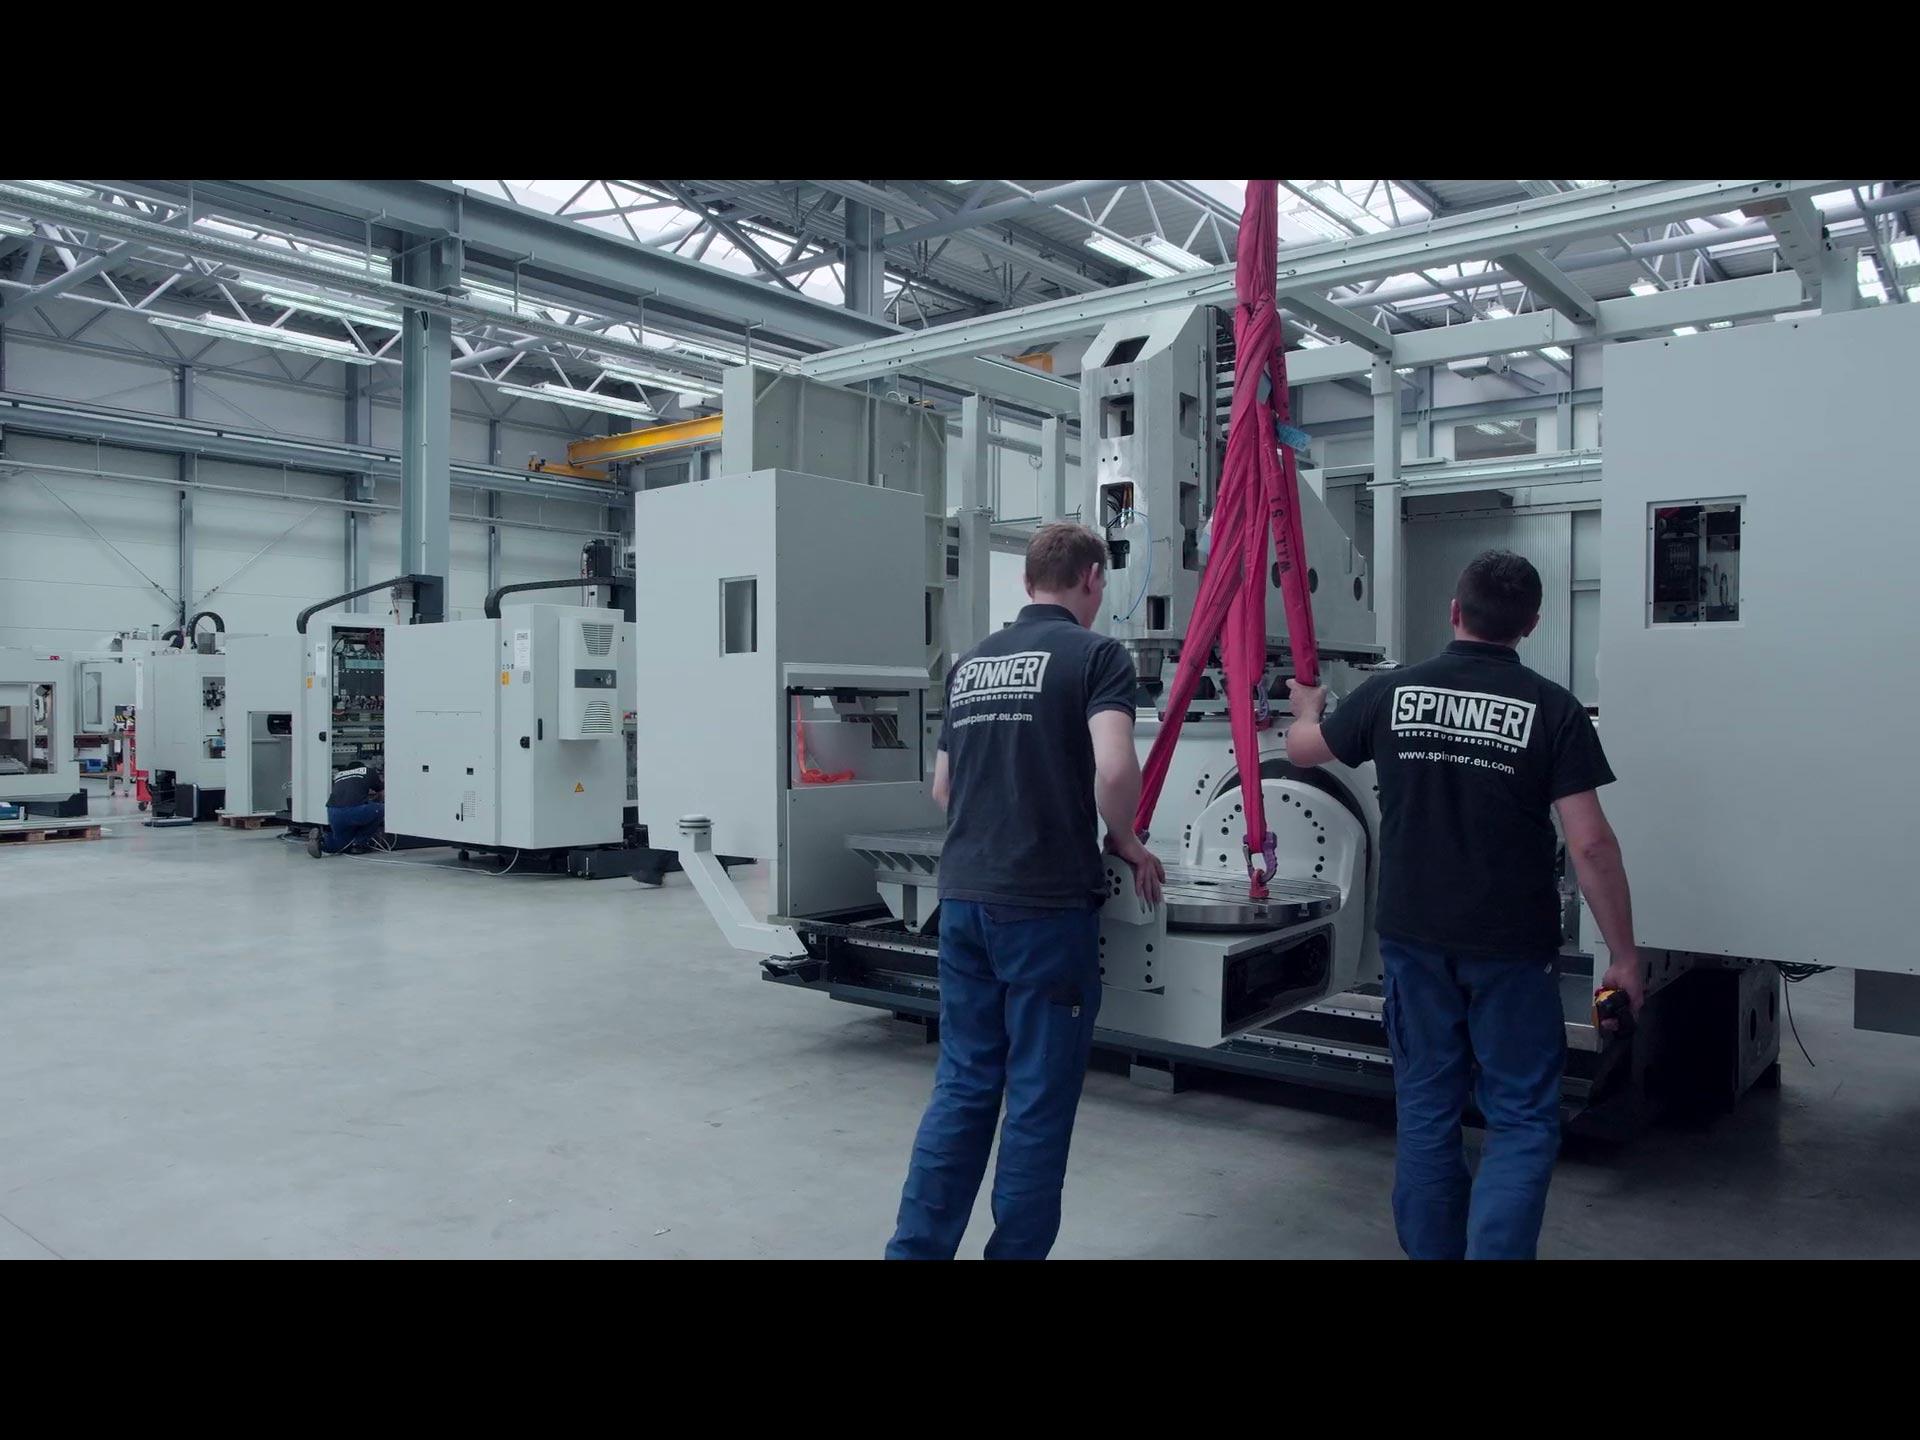 Spinner AG - Image Video der Spinner Werkzeugmaschinenfabrik